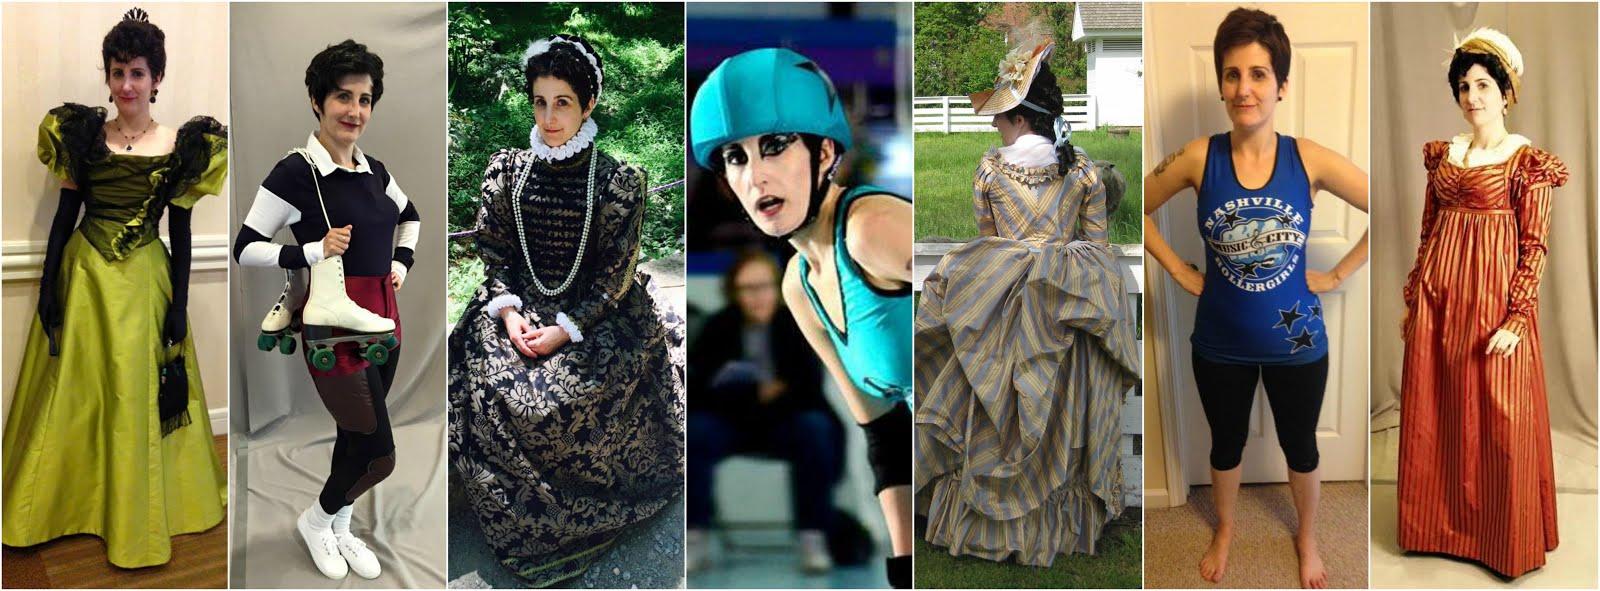 Lindsey Eastman Costumes